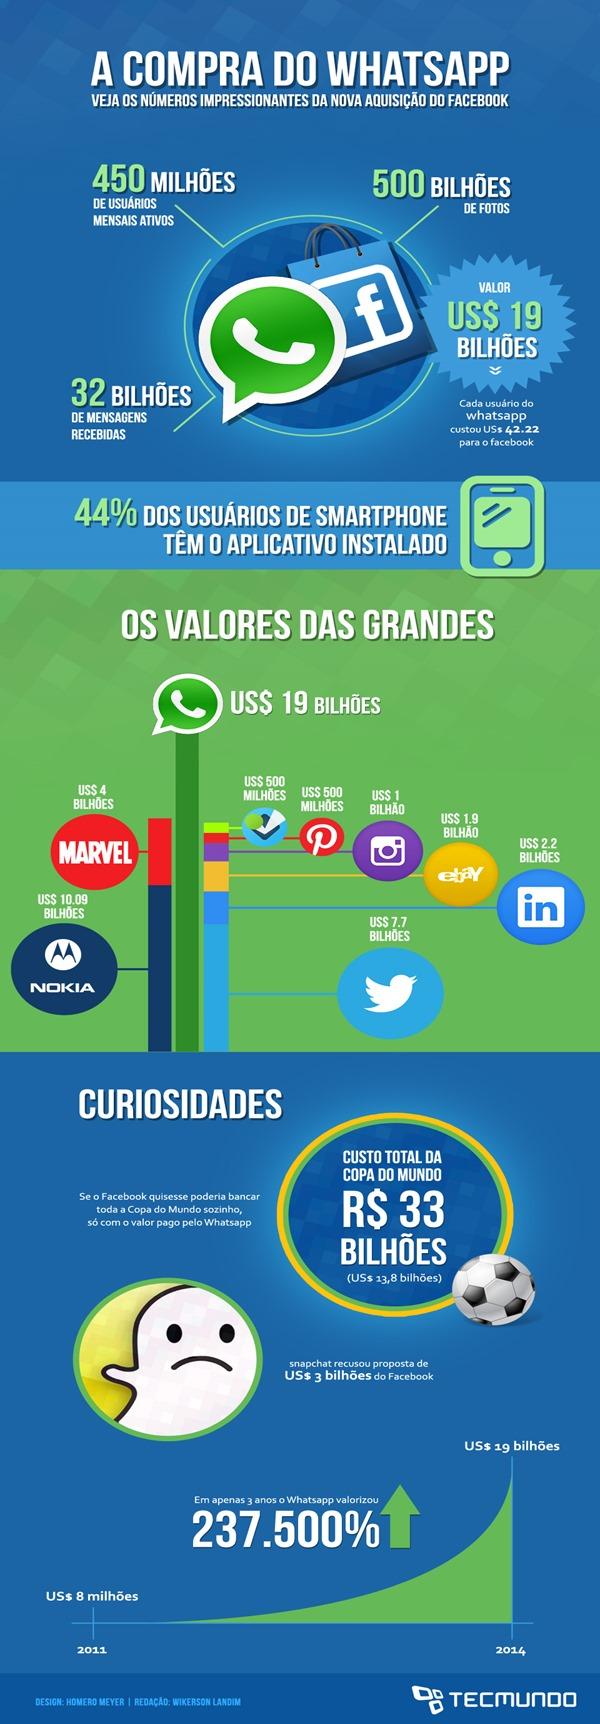 infografico-tecmundo-820018-515670